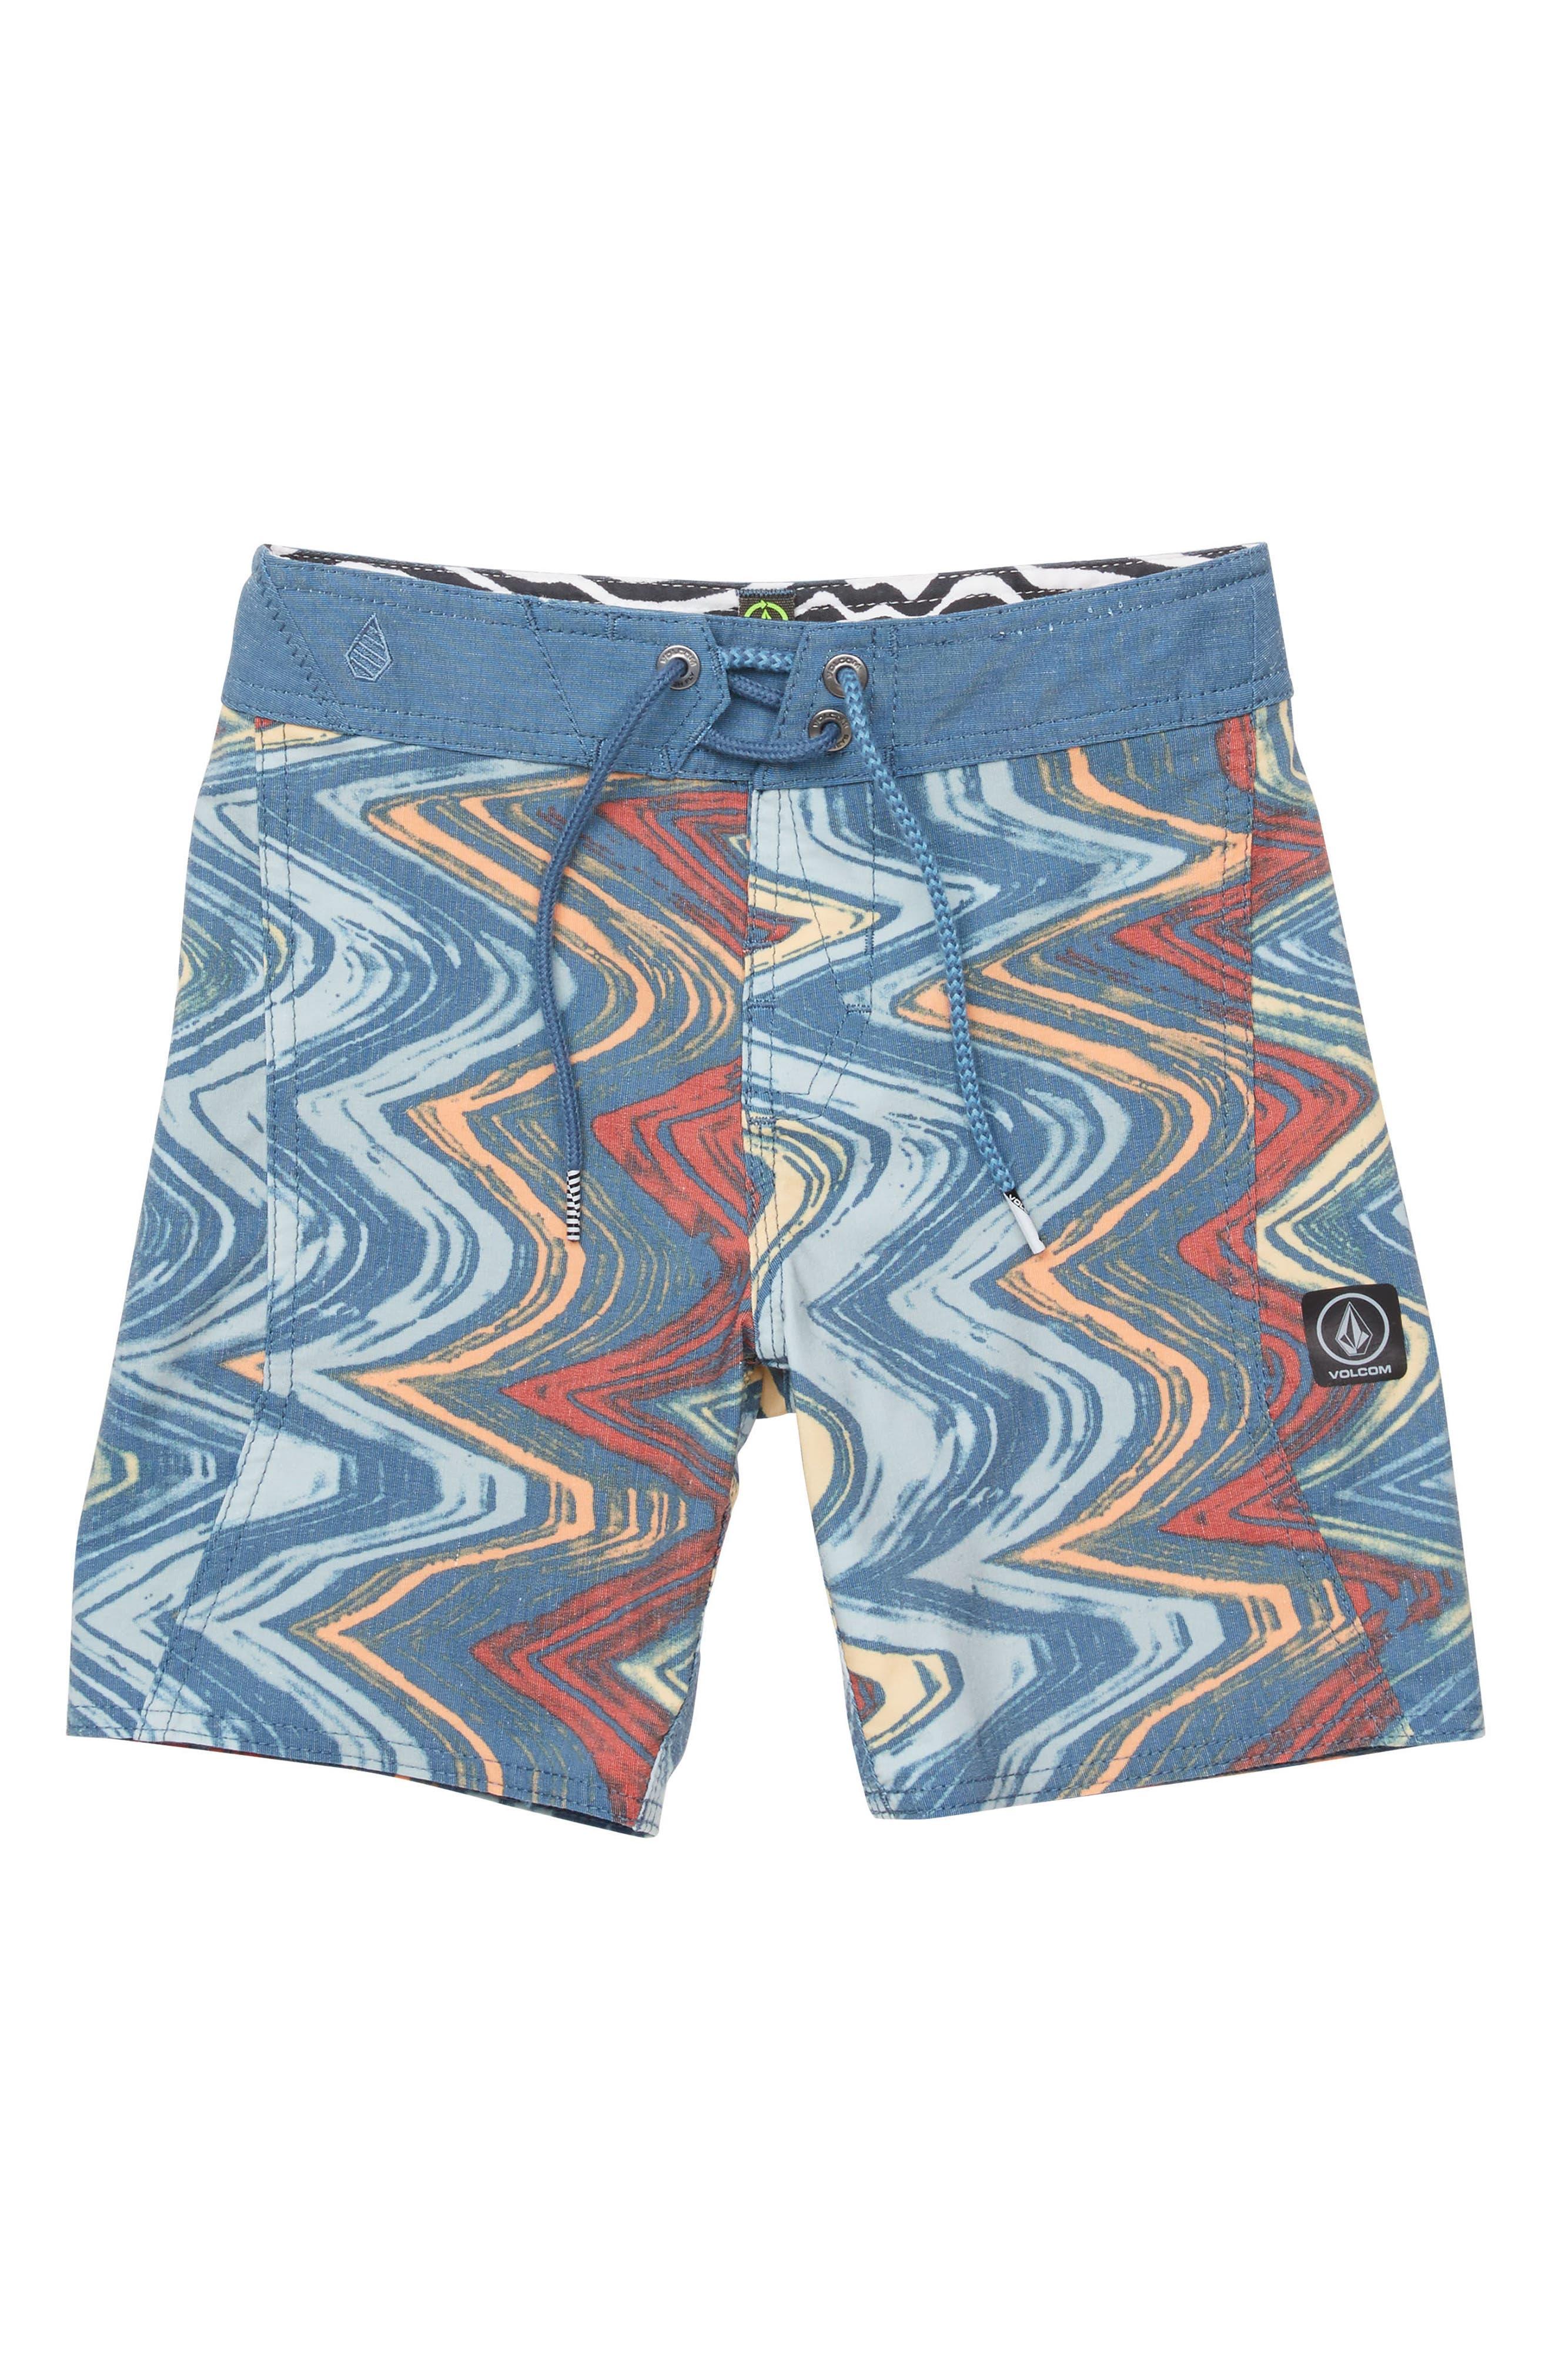 Lo-Fi Board Shorts,                         Main,                         color, SUNBURST